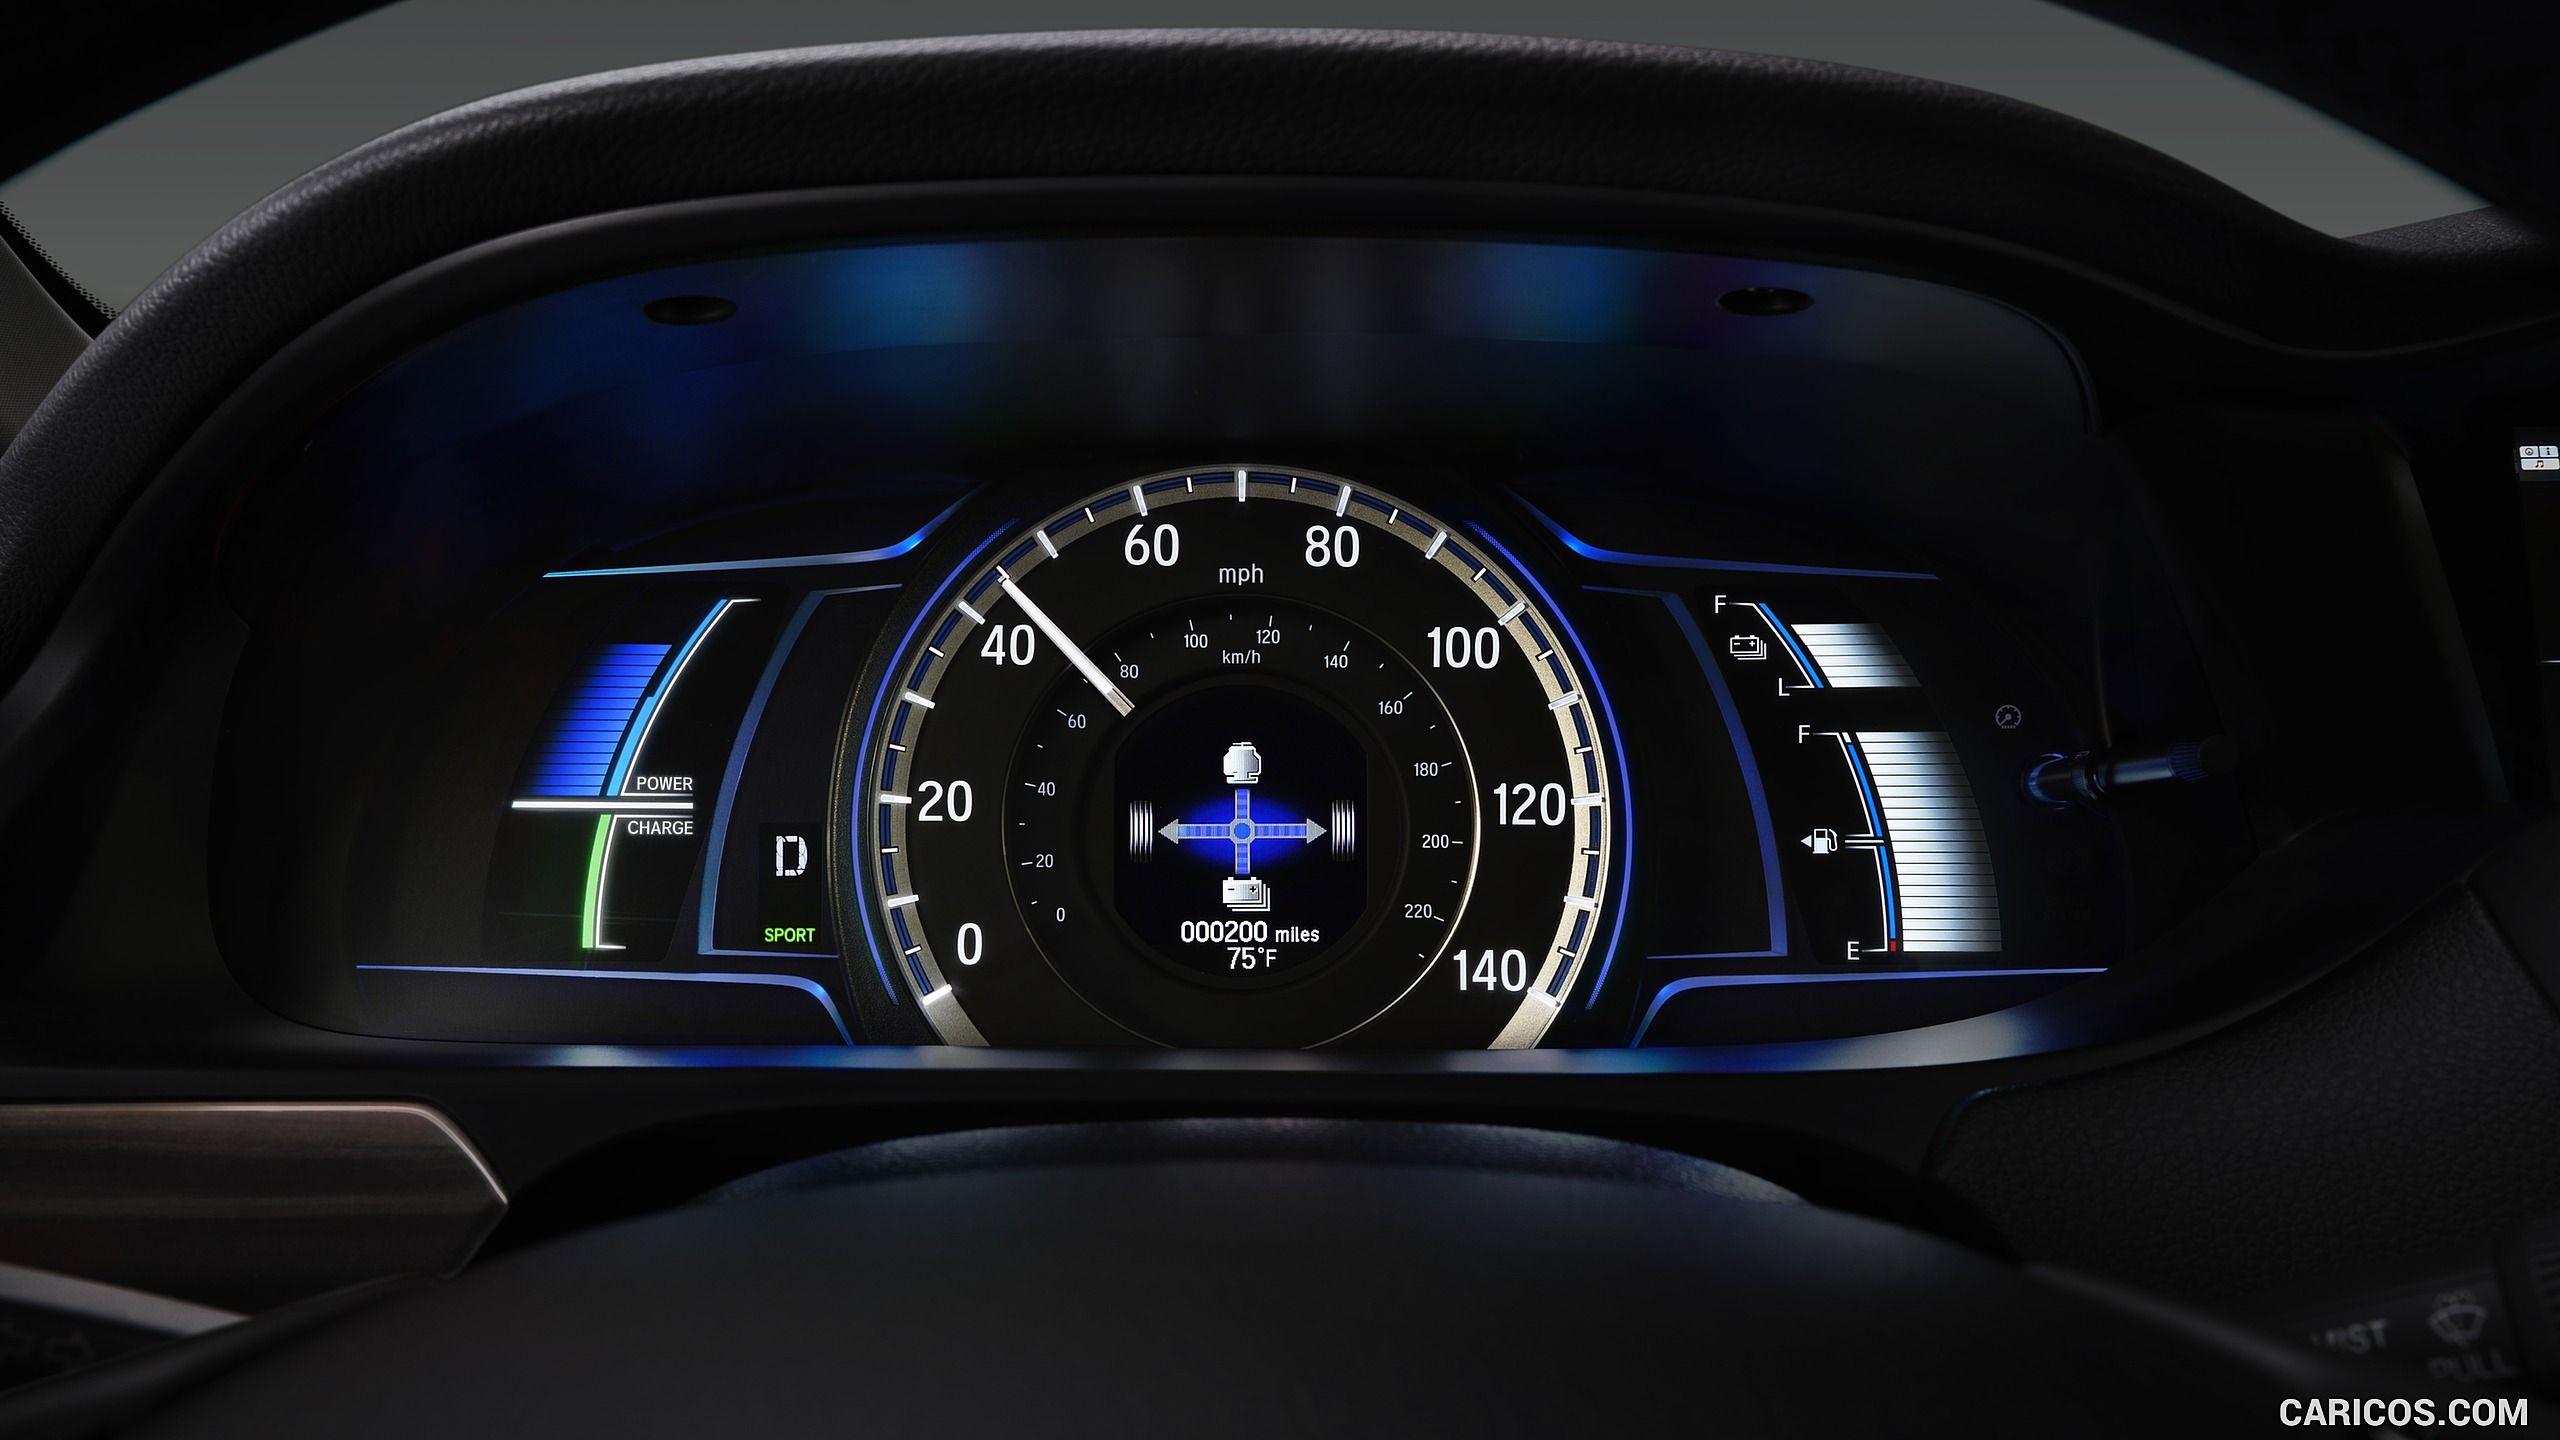 2017 Honda Accord Hybrid Instrument Cluster Hd Honda Accord